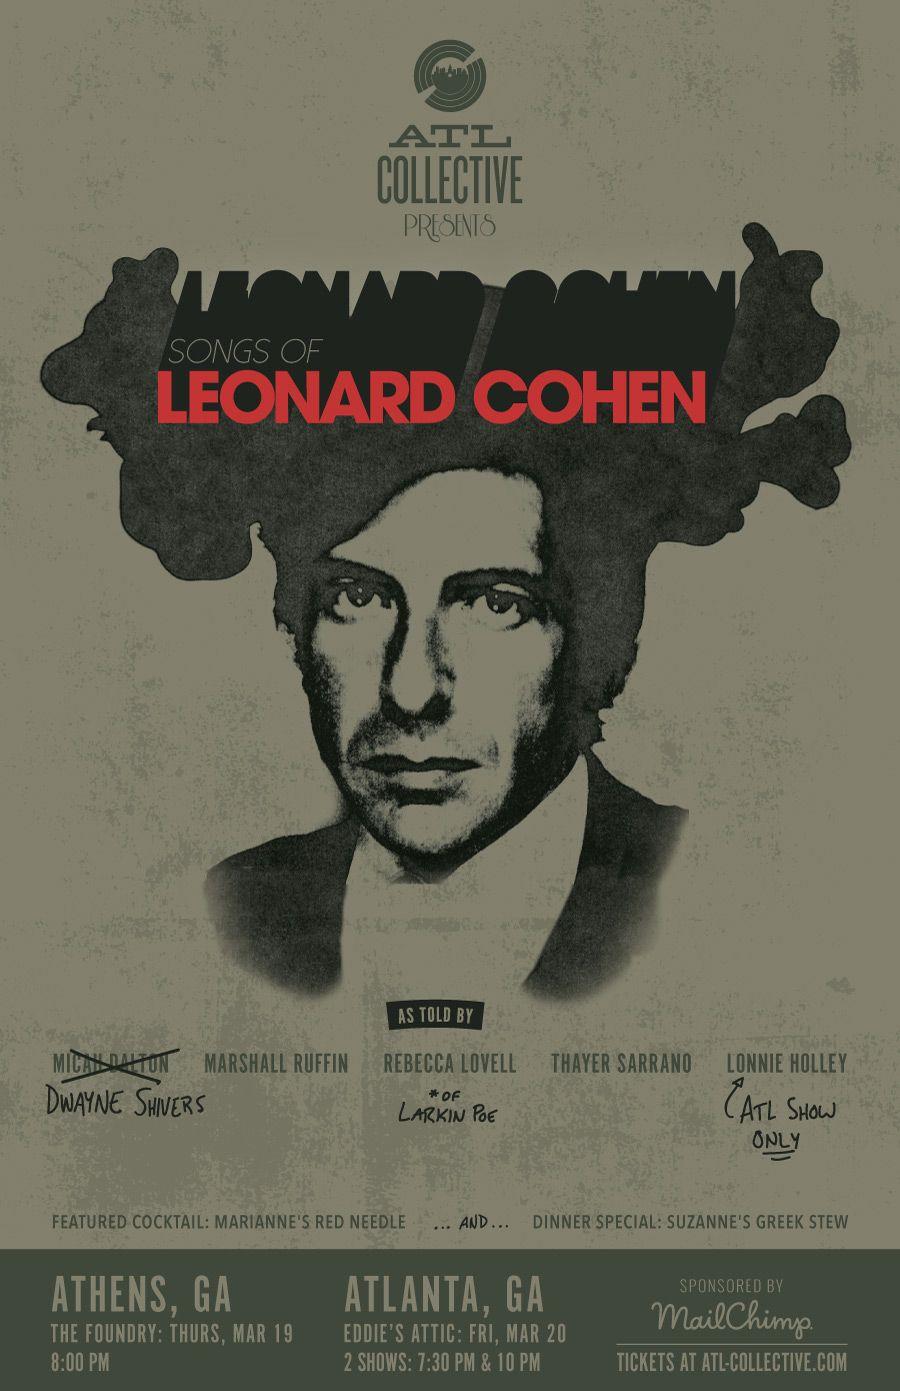 behance leonard cohen leonard